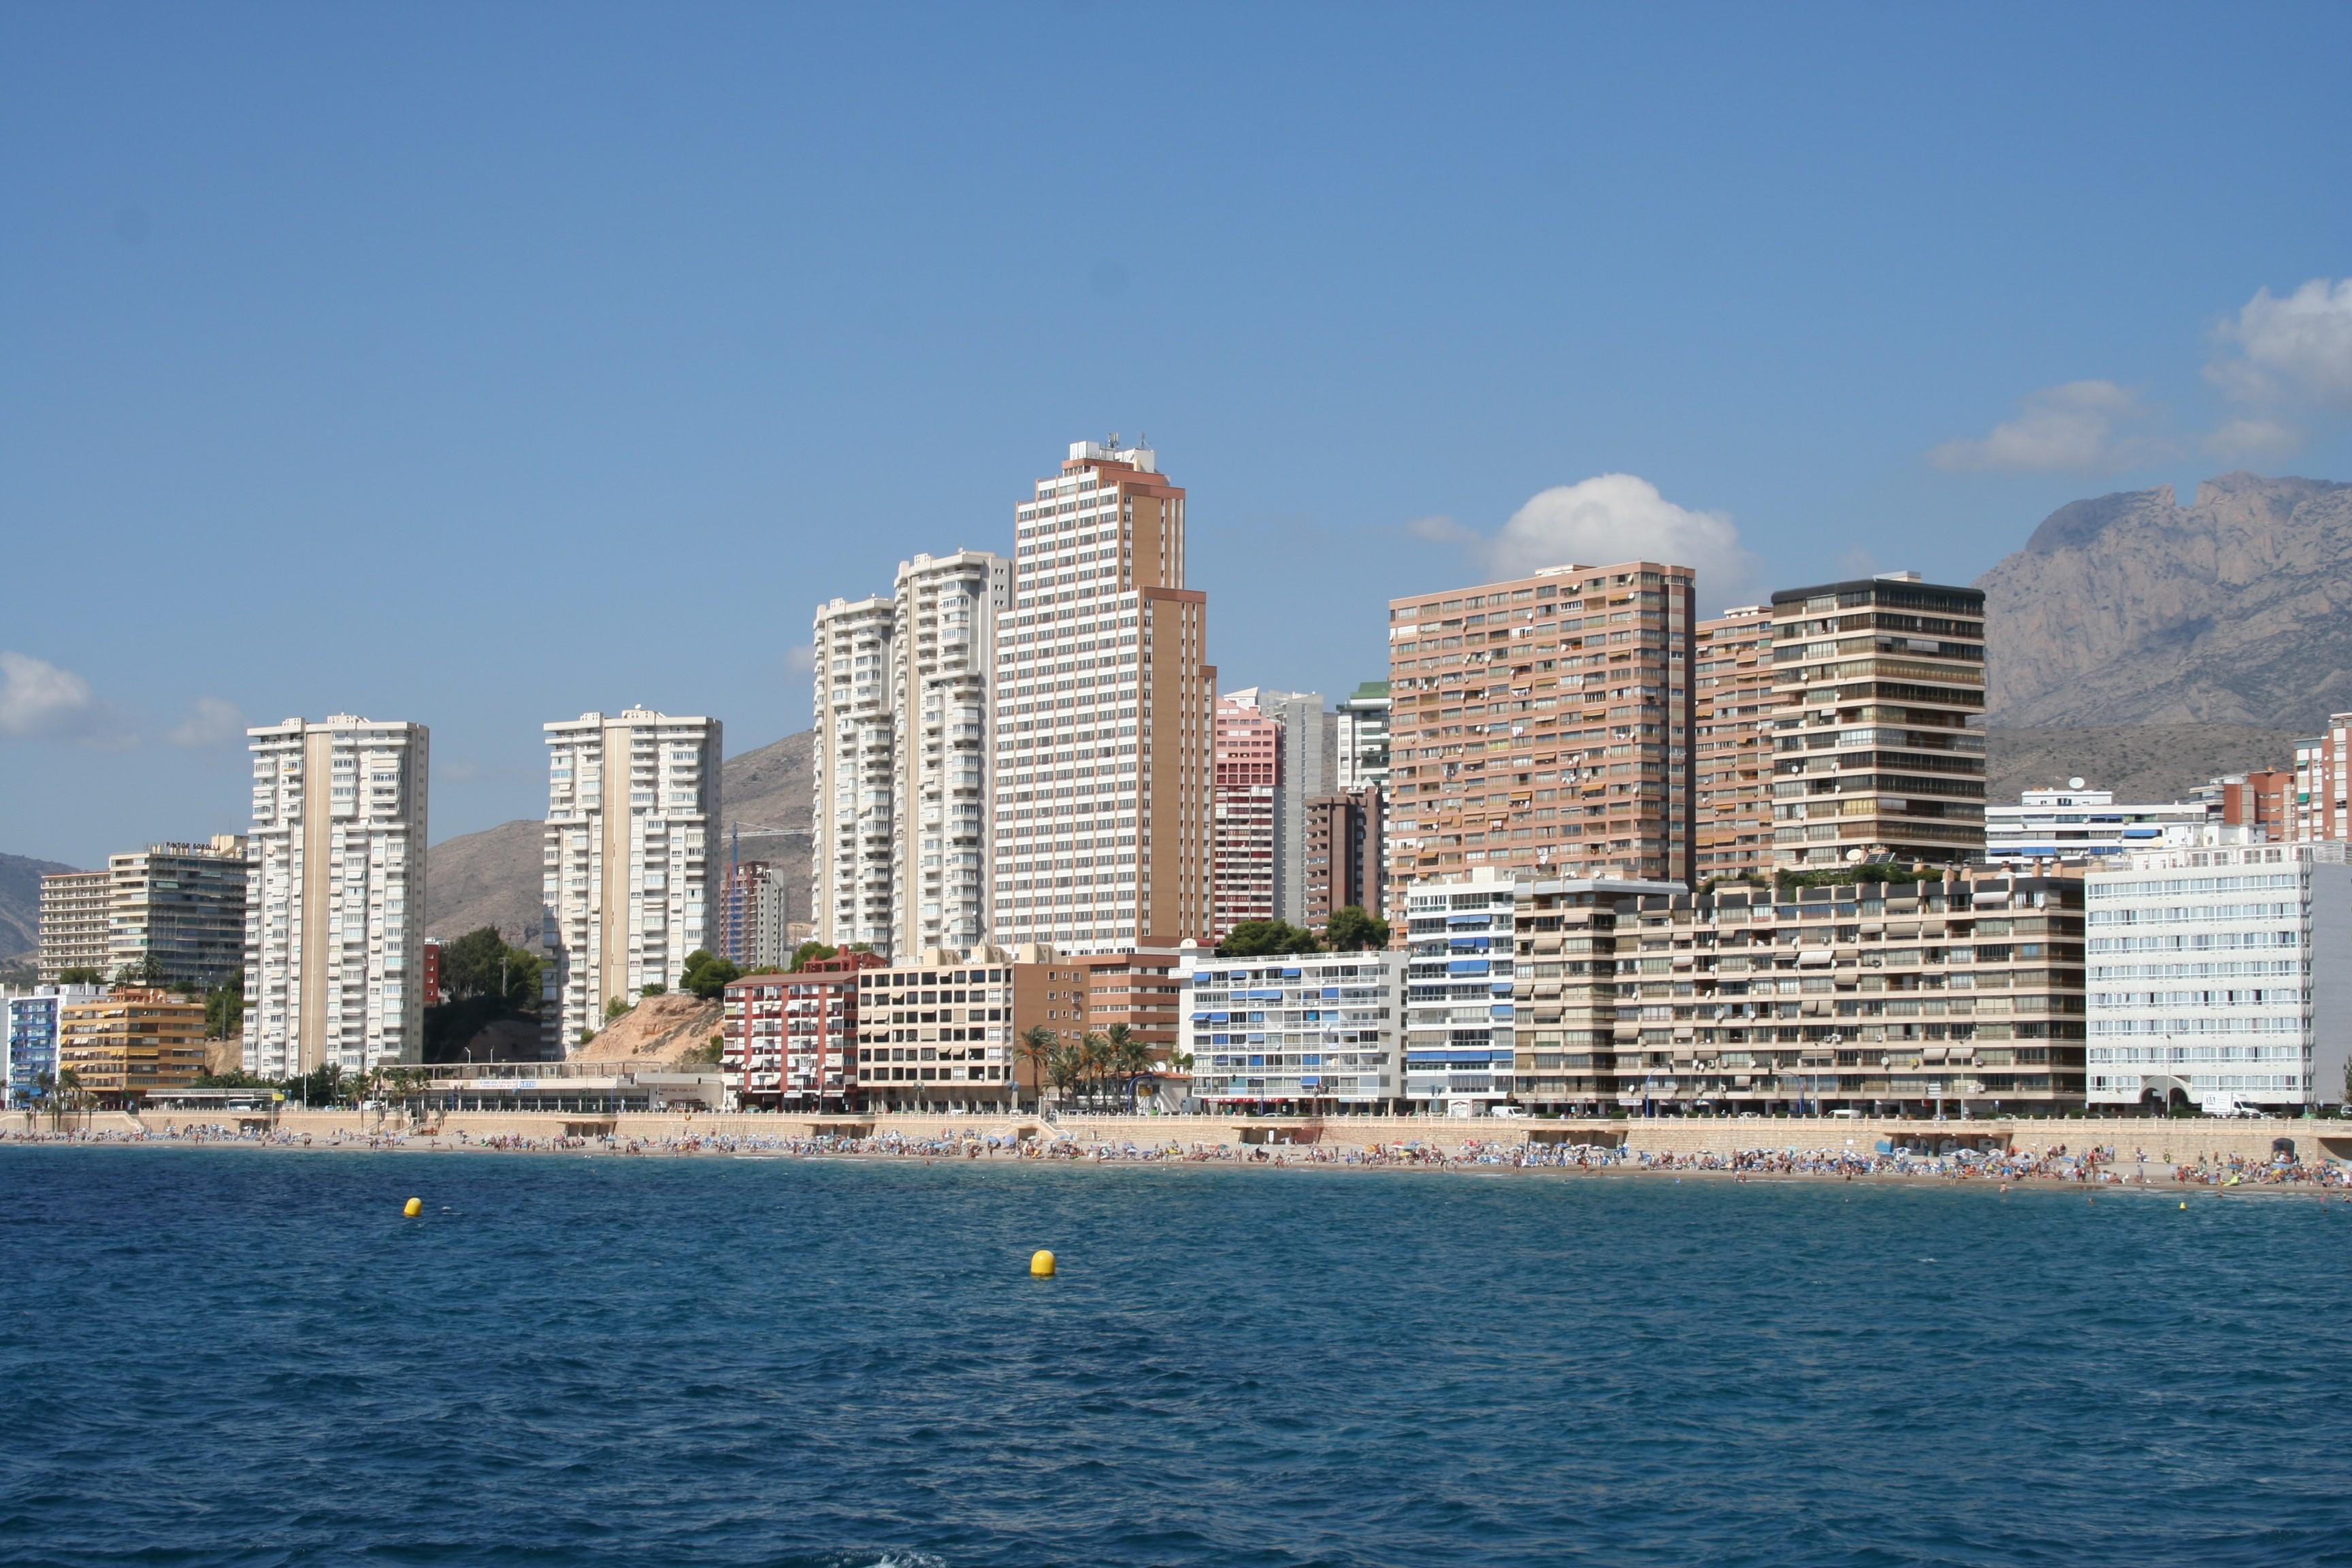 Испания заняла пятое место в Европе по объему инвестиций в недвижимость